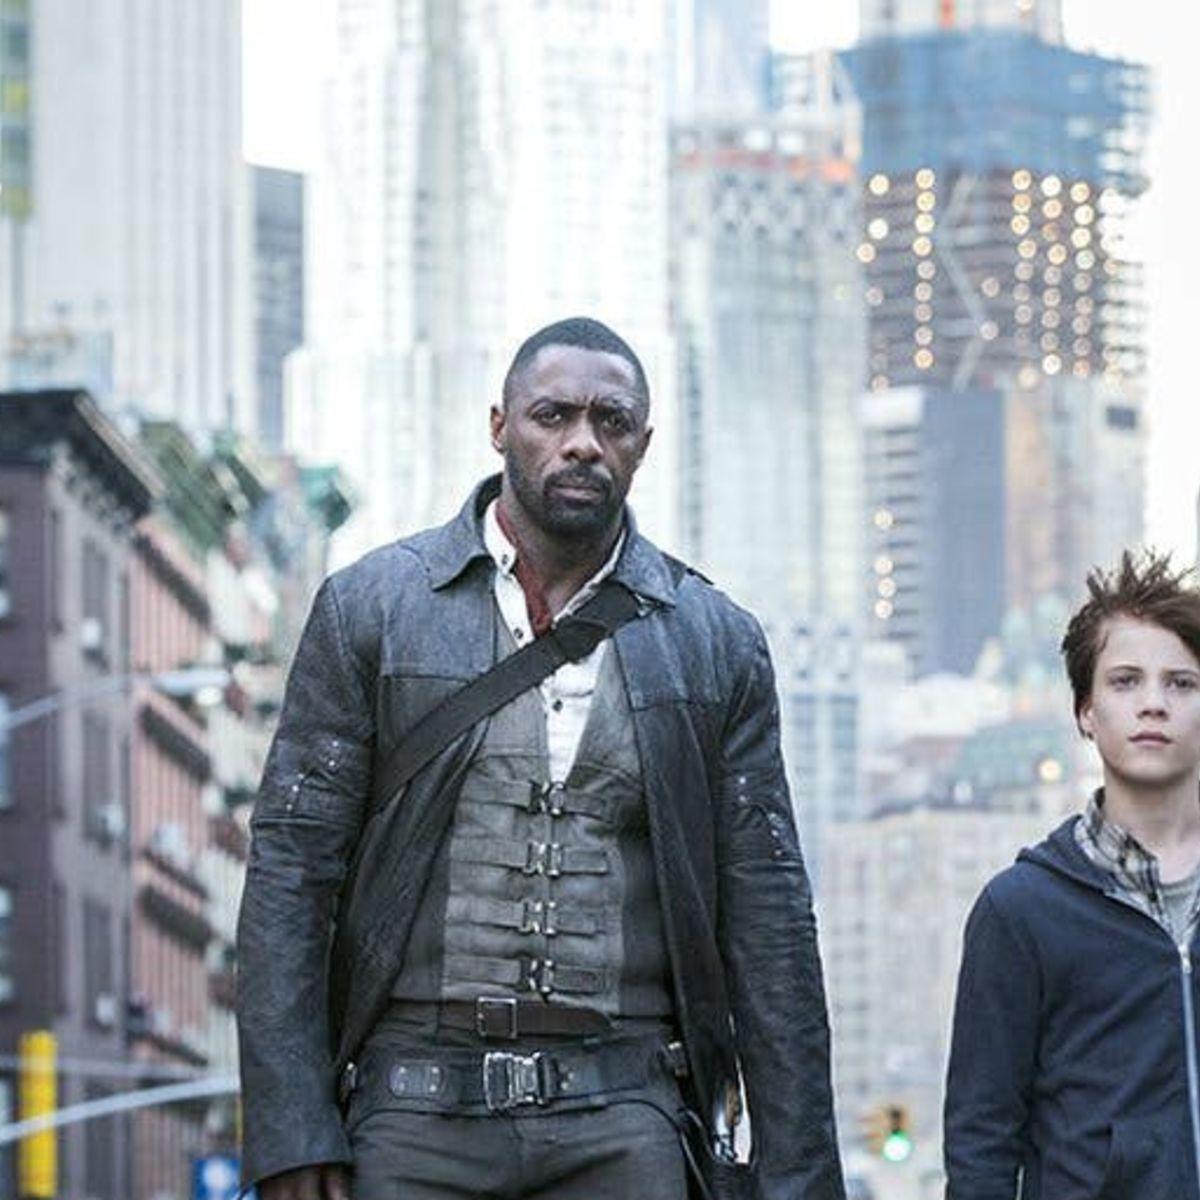 Idris Elba describes the challenge of bringing diversity to ...